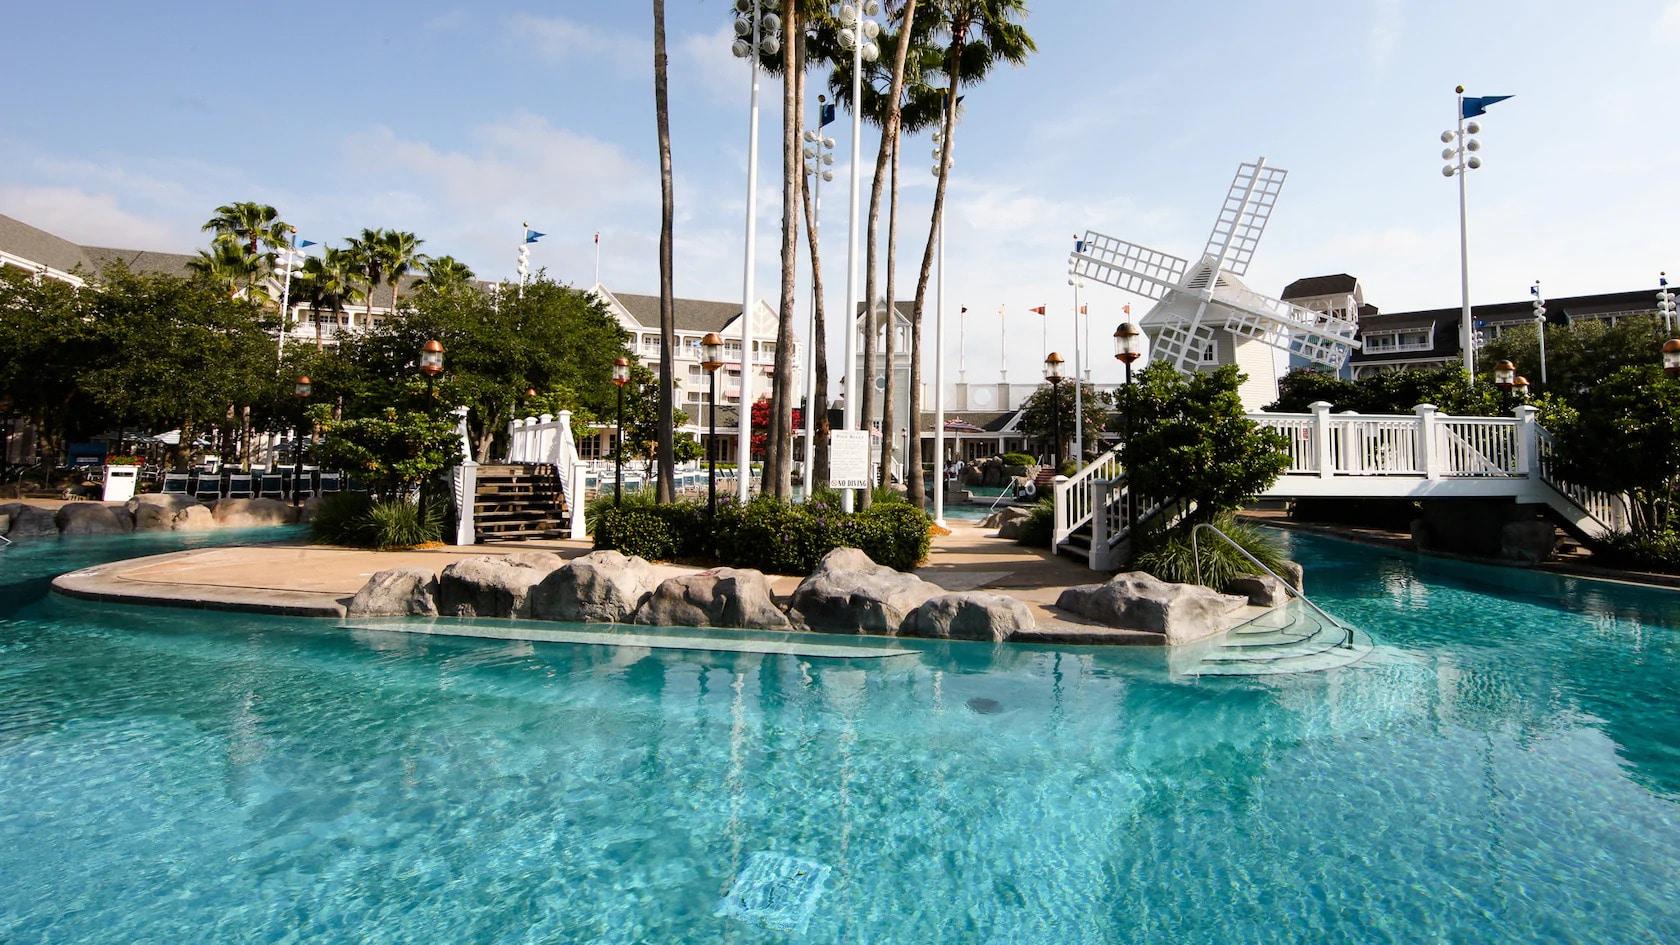 2021 Disney World Hotel Reviews